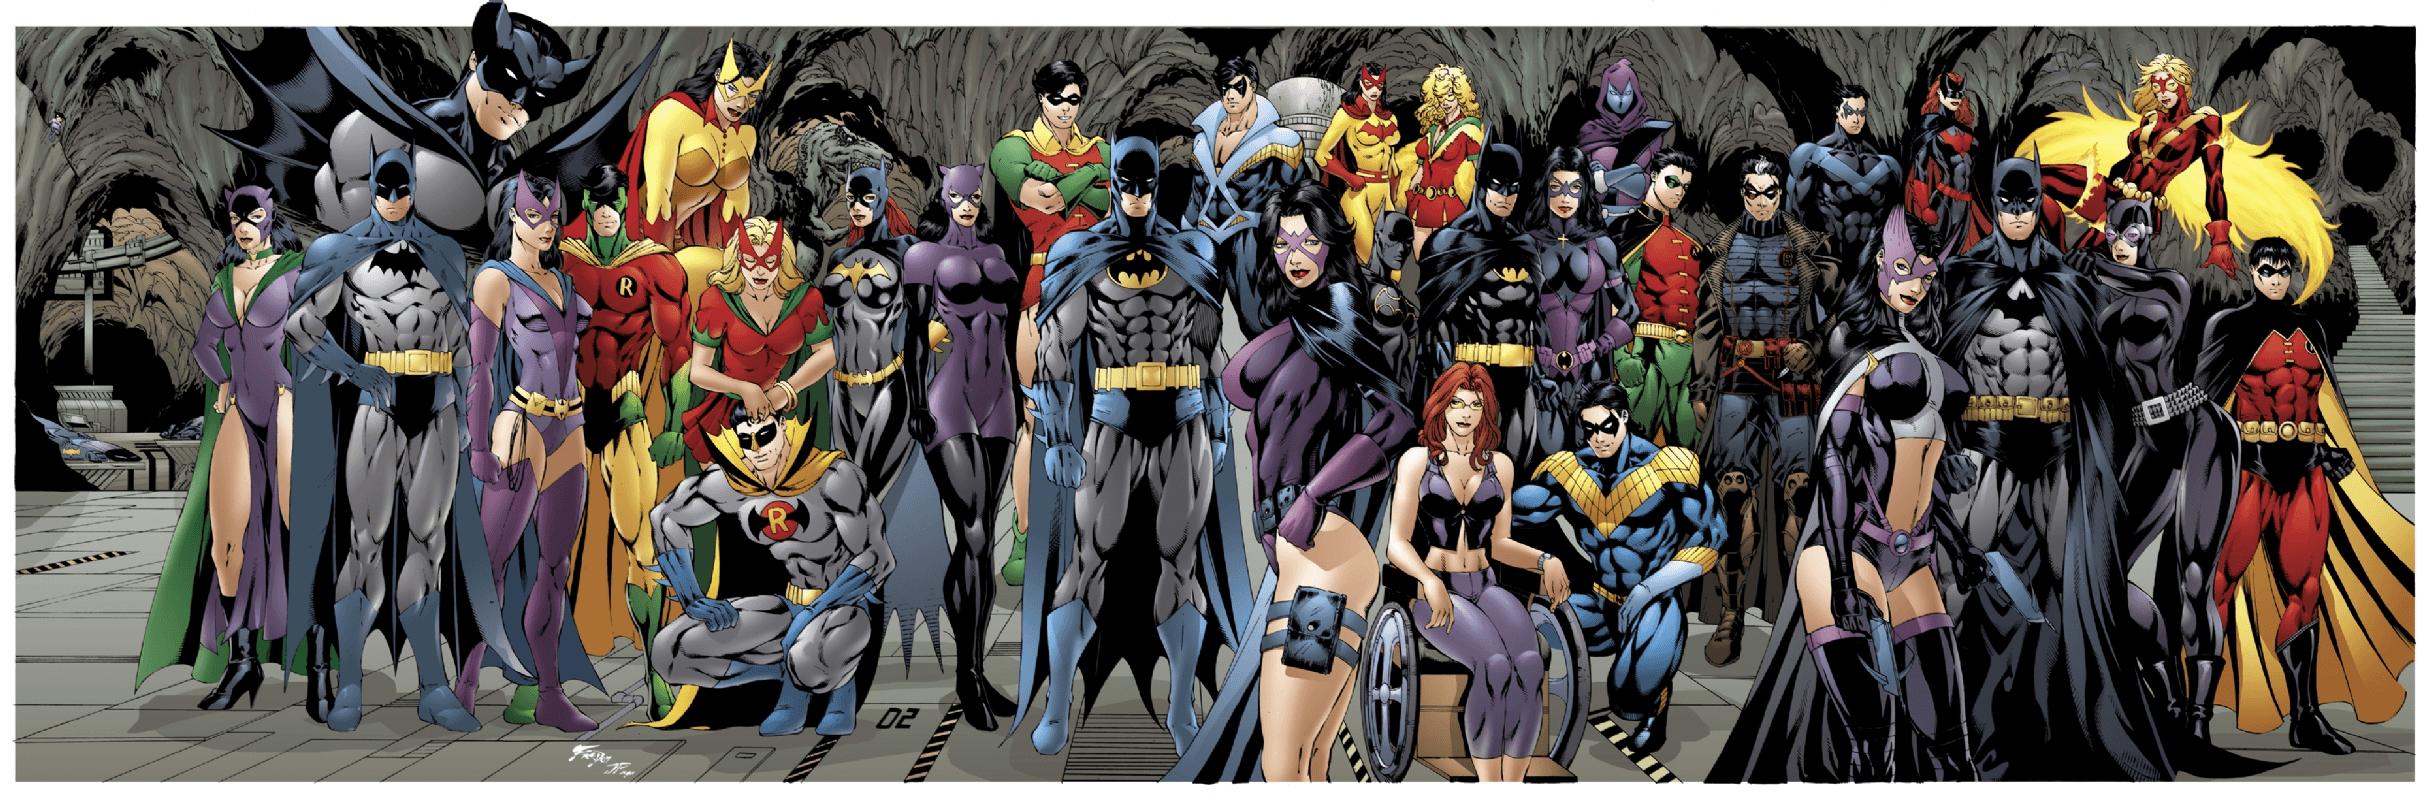 The batfamilies.png